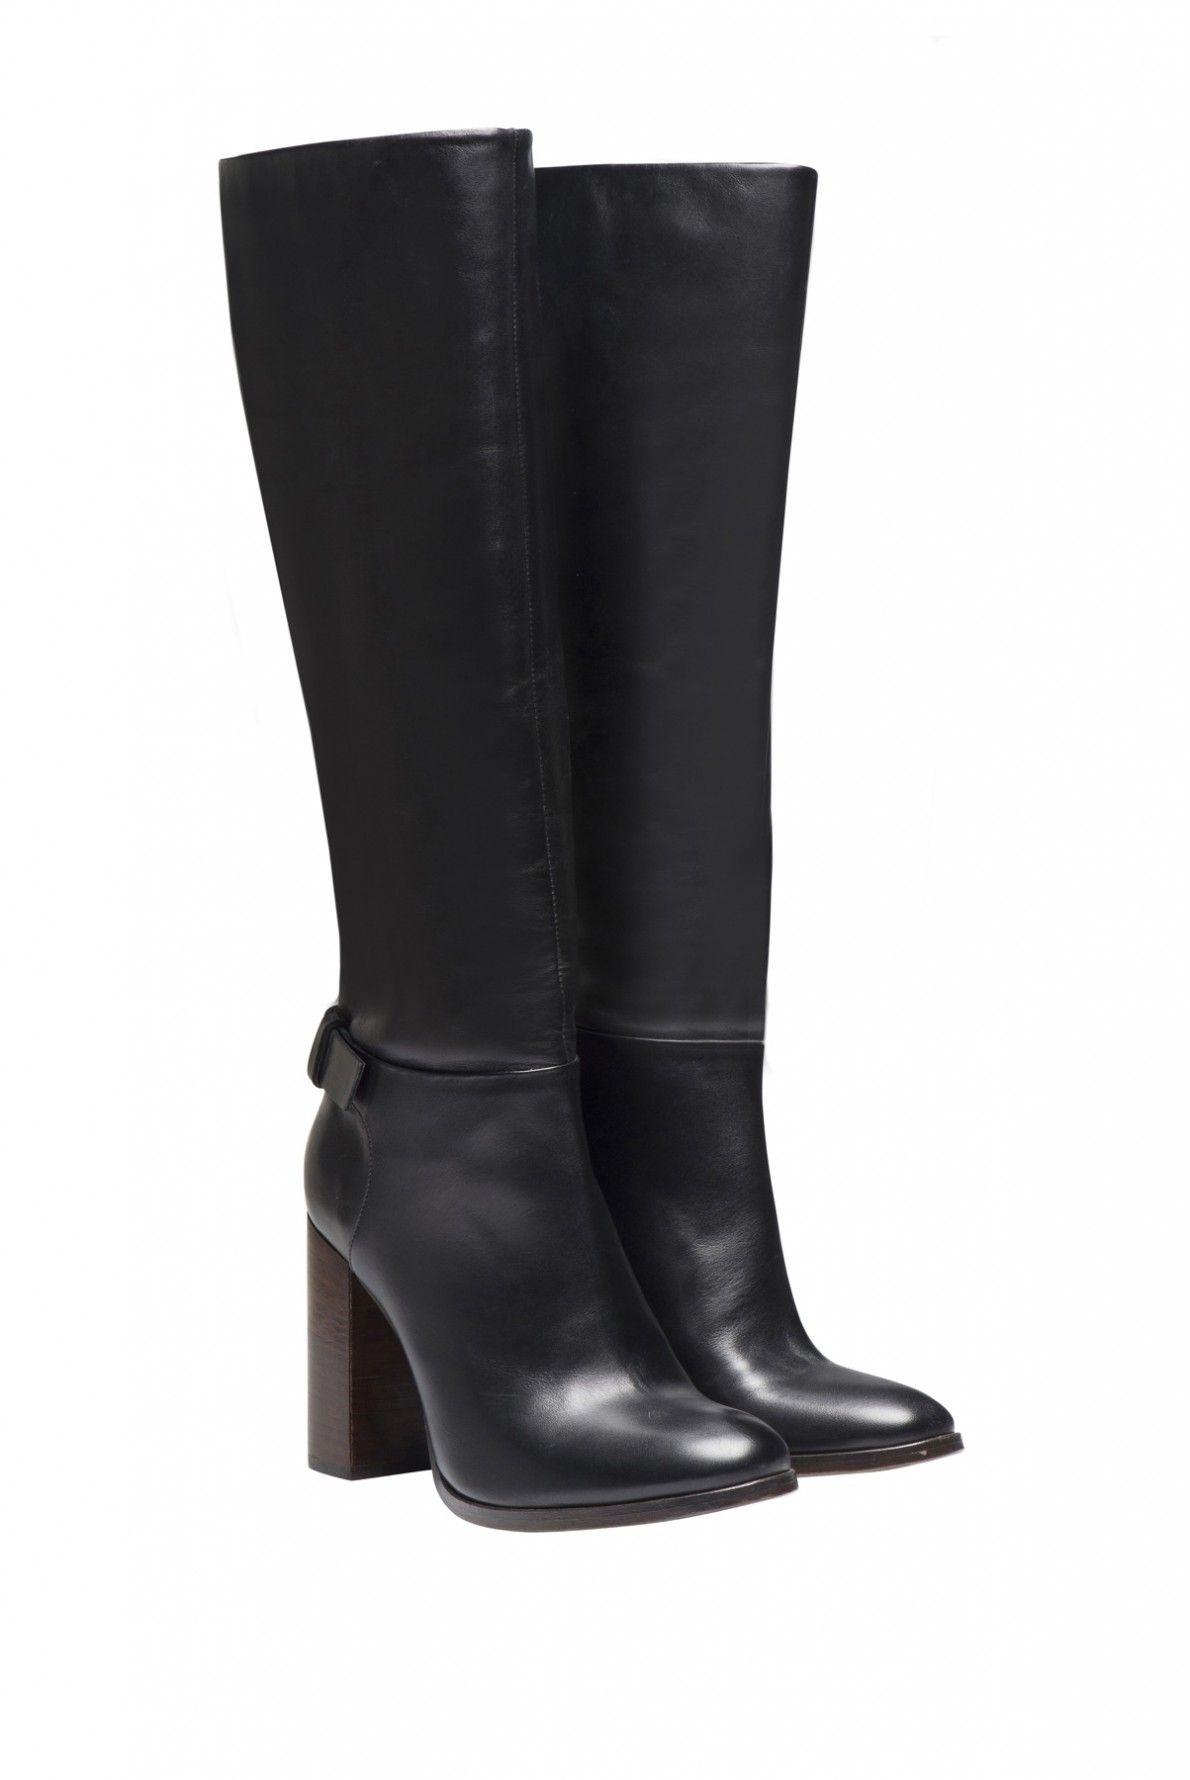 Bottes, chaussure noir | gerard darel | Chaussures noires